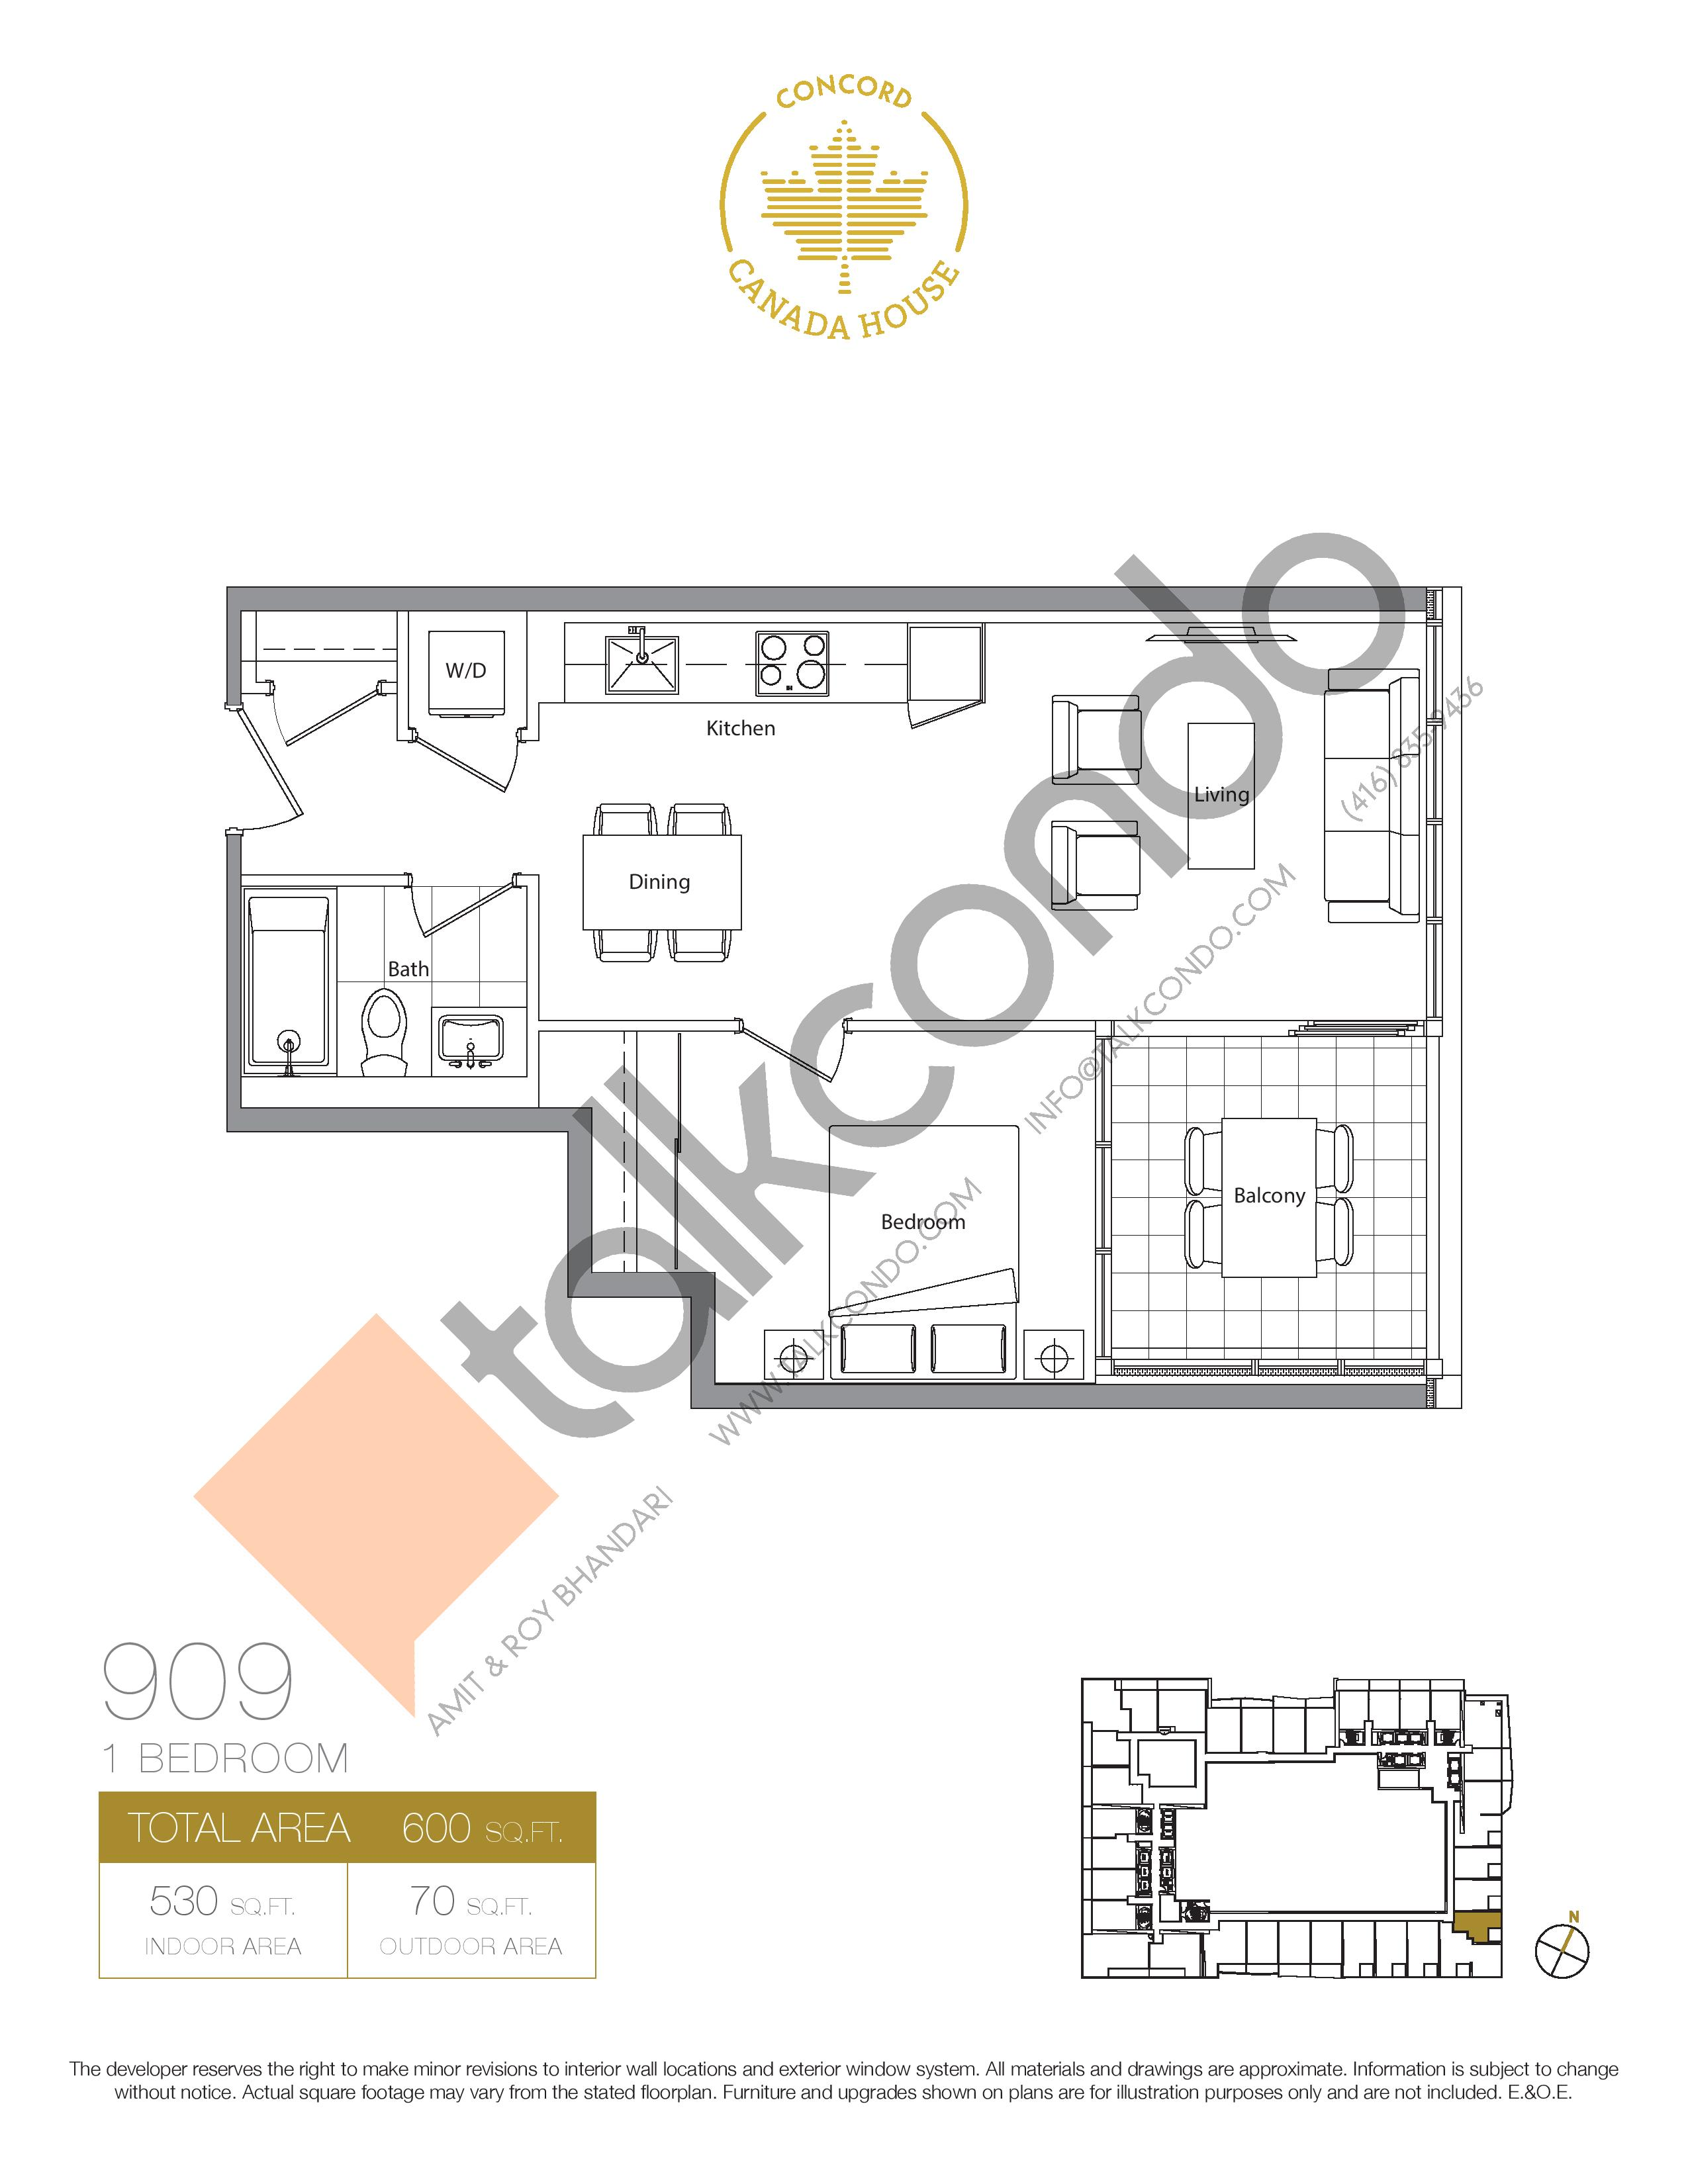 909 (Podium) Floor Plan at Concord Canada House Condos - 530 sq.ft